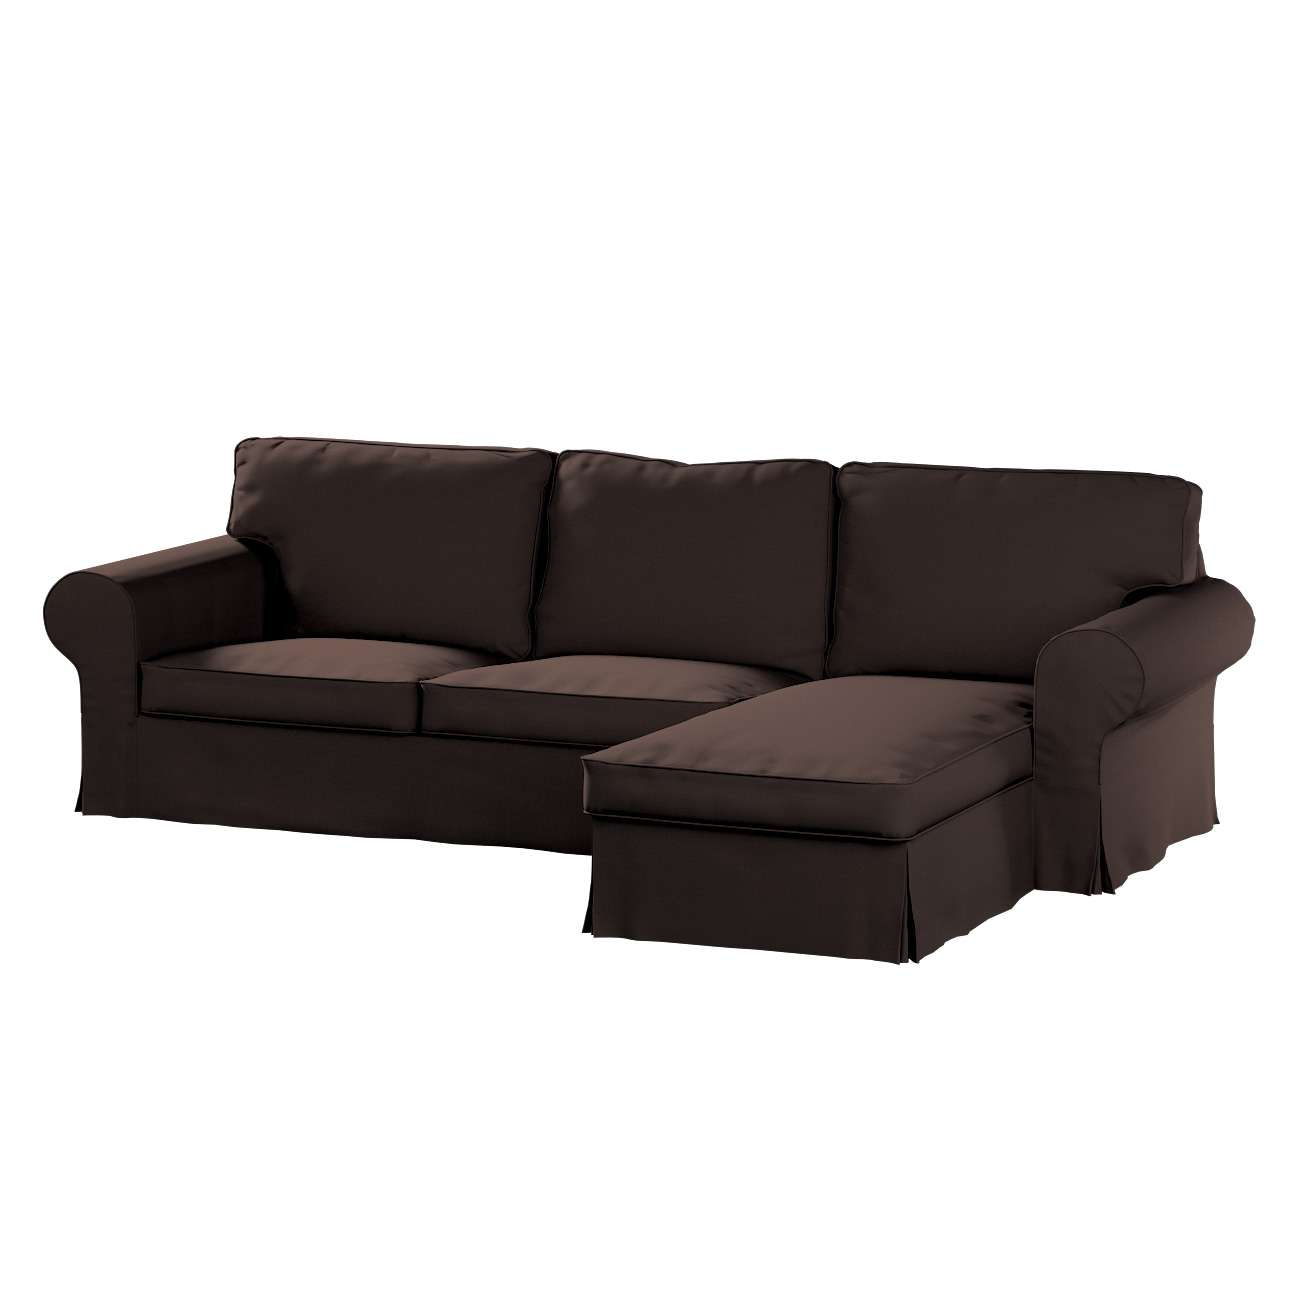 Ektorp 2-Sitzer Sofabezug mit Recamiere Ektorp 2-Sitzer Sofabezug mit Recamiere von der Kollektion Cotton Panama, Stoff: 702-03